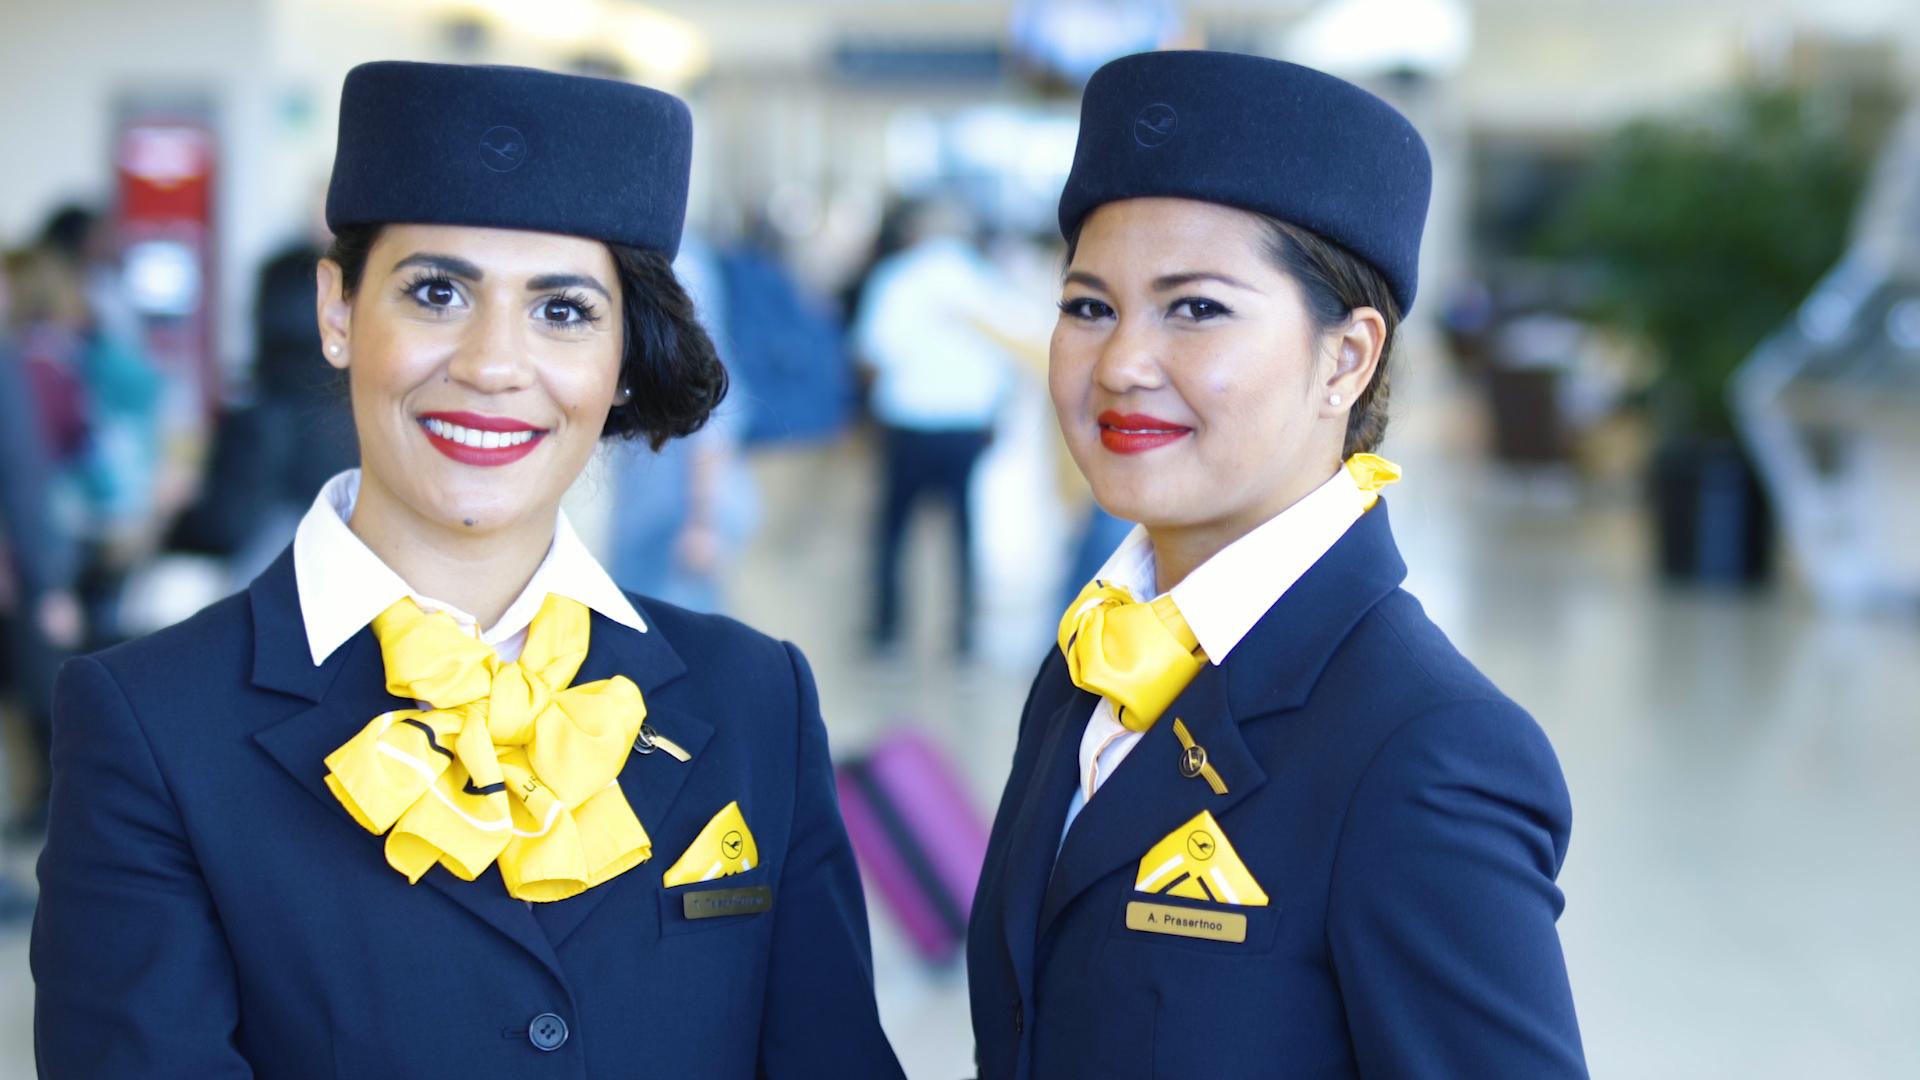 Lufthansa Snapchat Stories